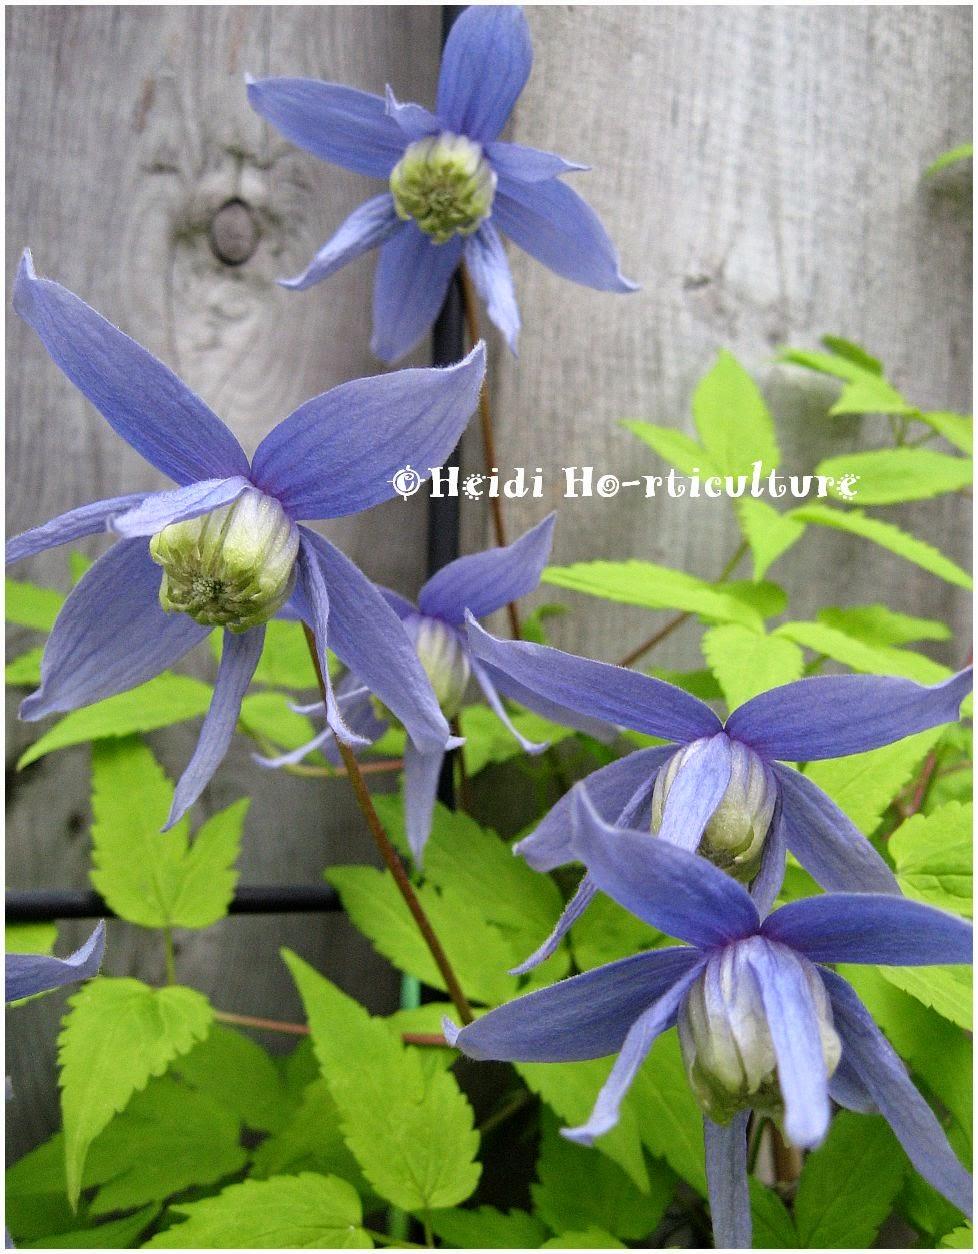 heidi horticulture plant profile stolwijk alpina blue. Black Bedroom Furniture Sets. Home Design Ideas